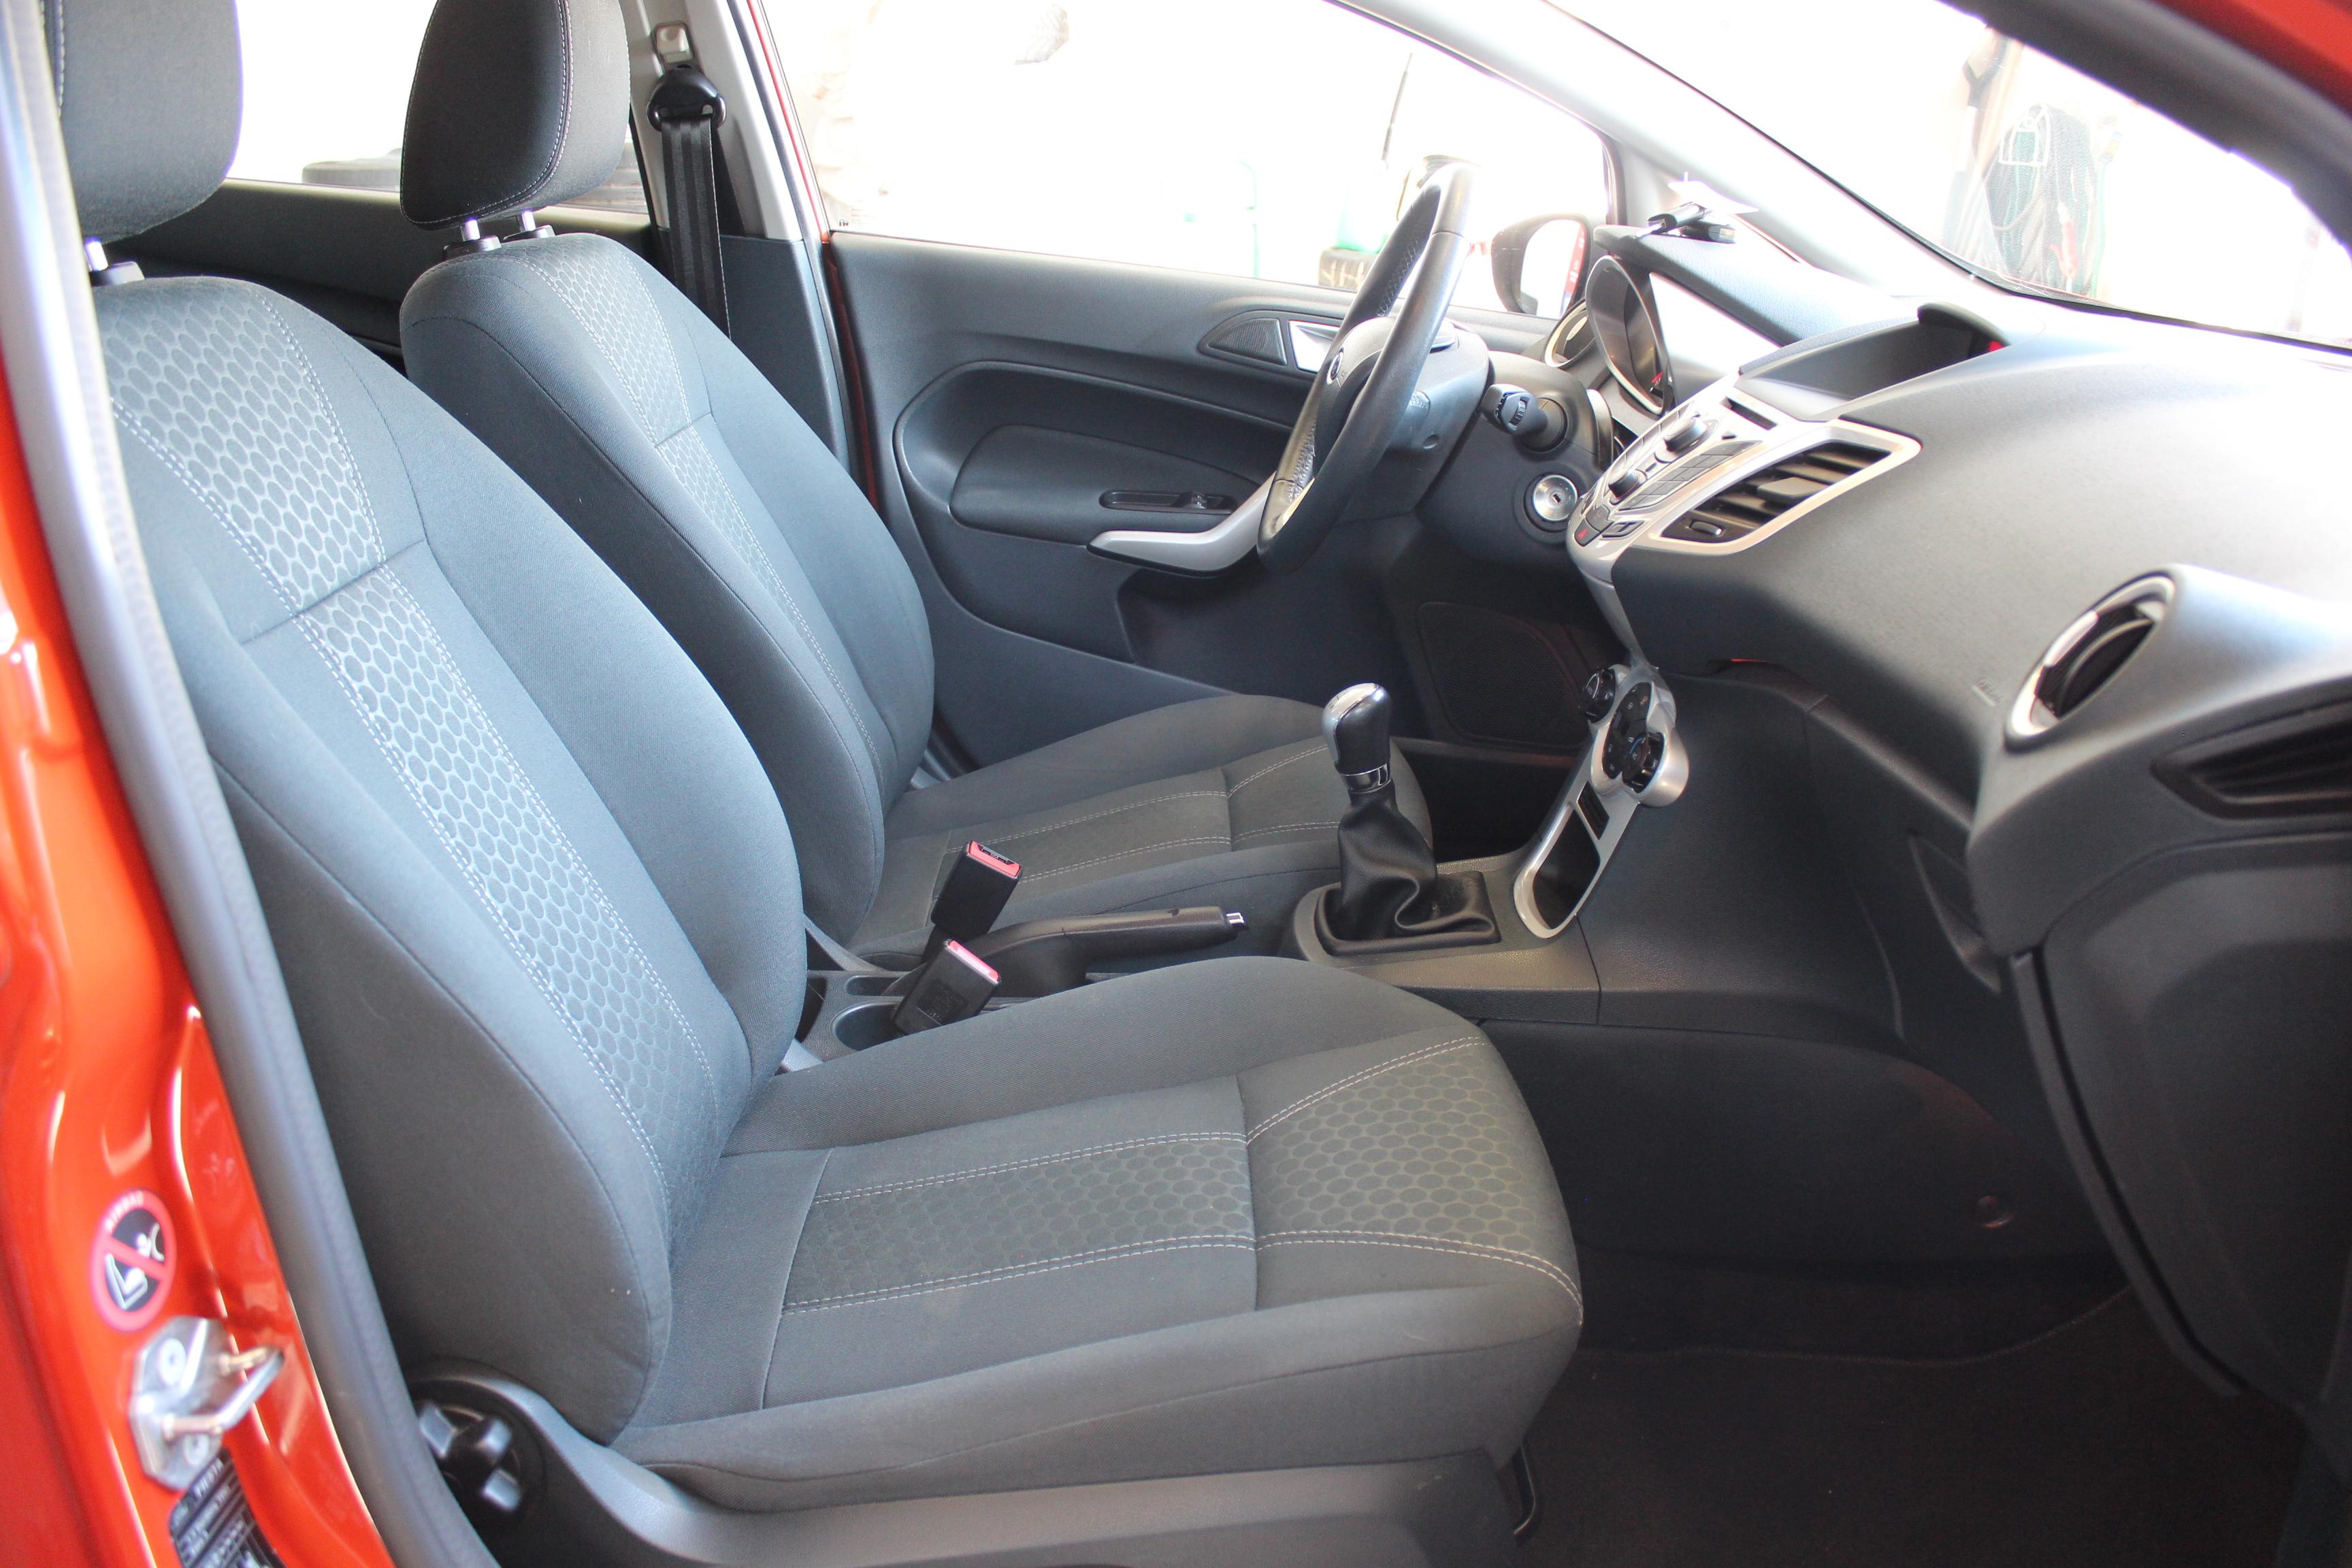 Ford Fiesta 5-dörrar 1.4 TDCi 70hk